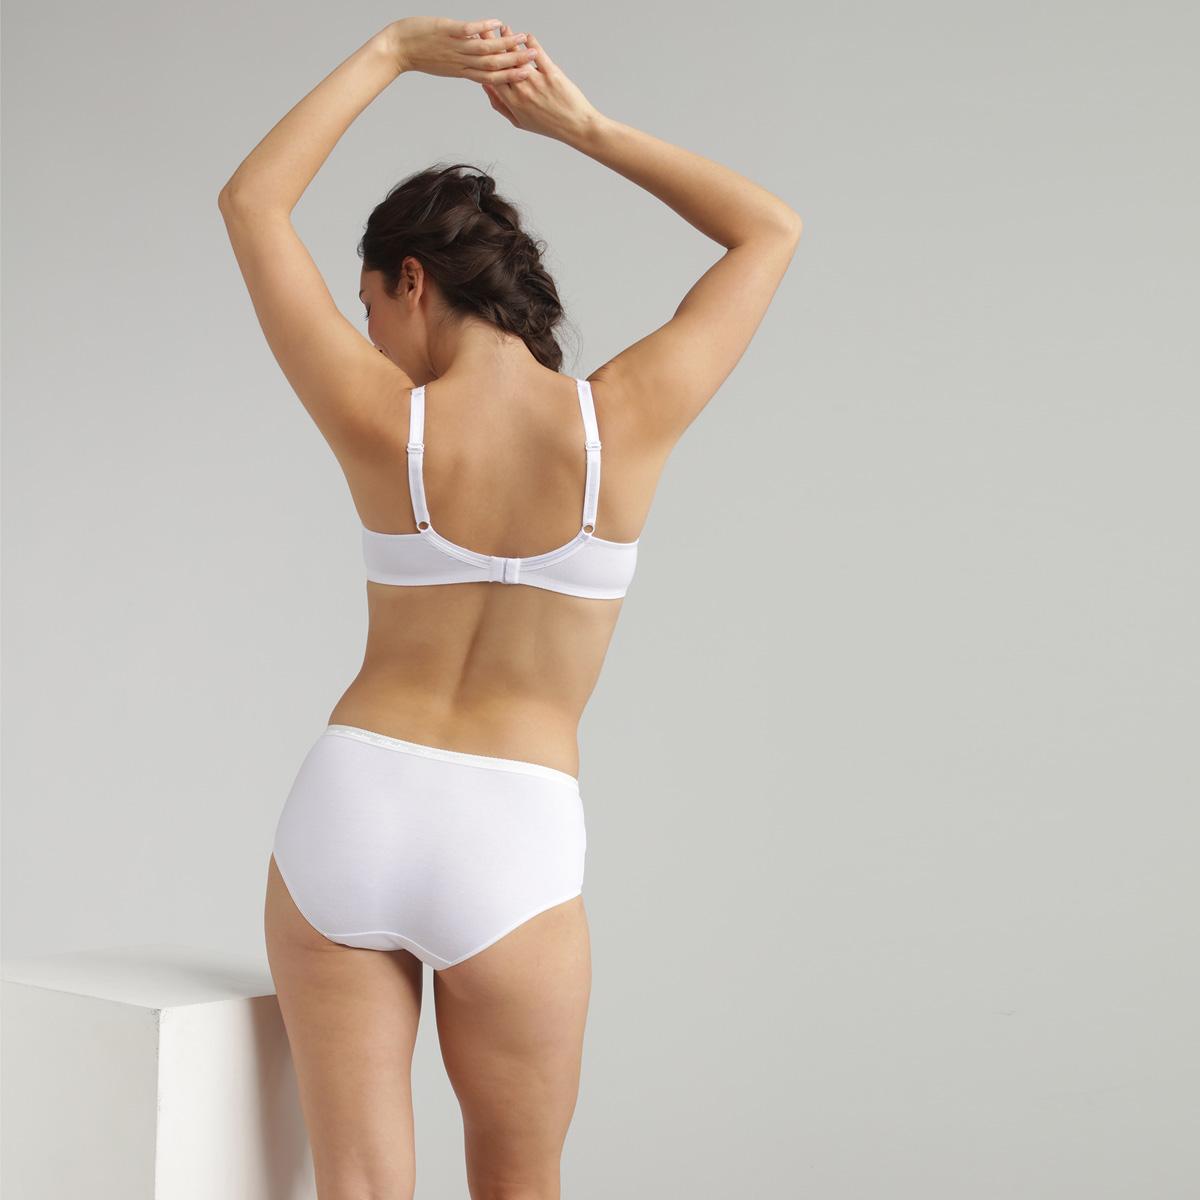 Non-wired cotton bra in white Cotton Support, , PLAYTEX